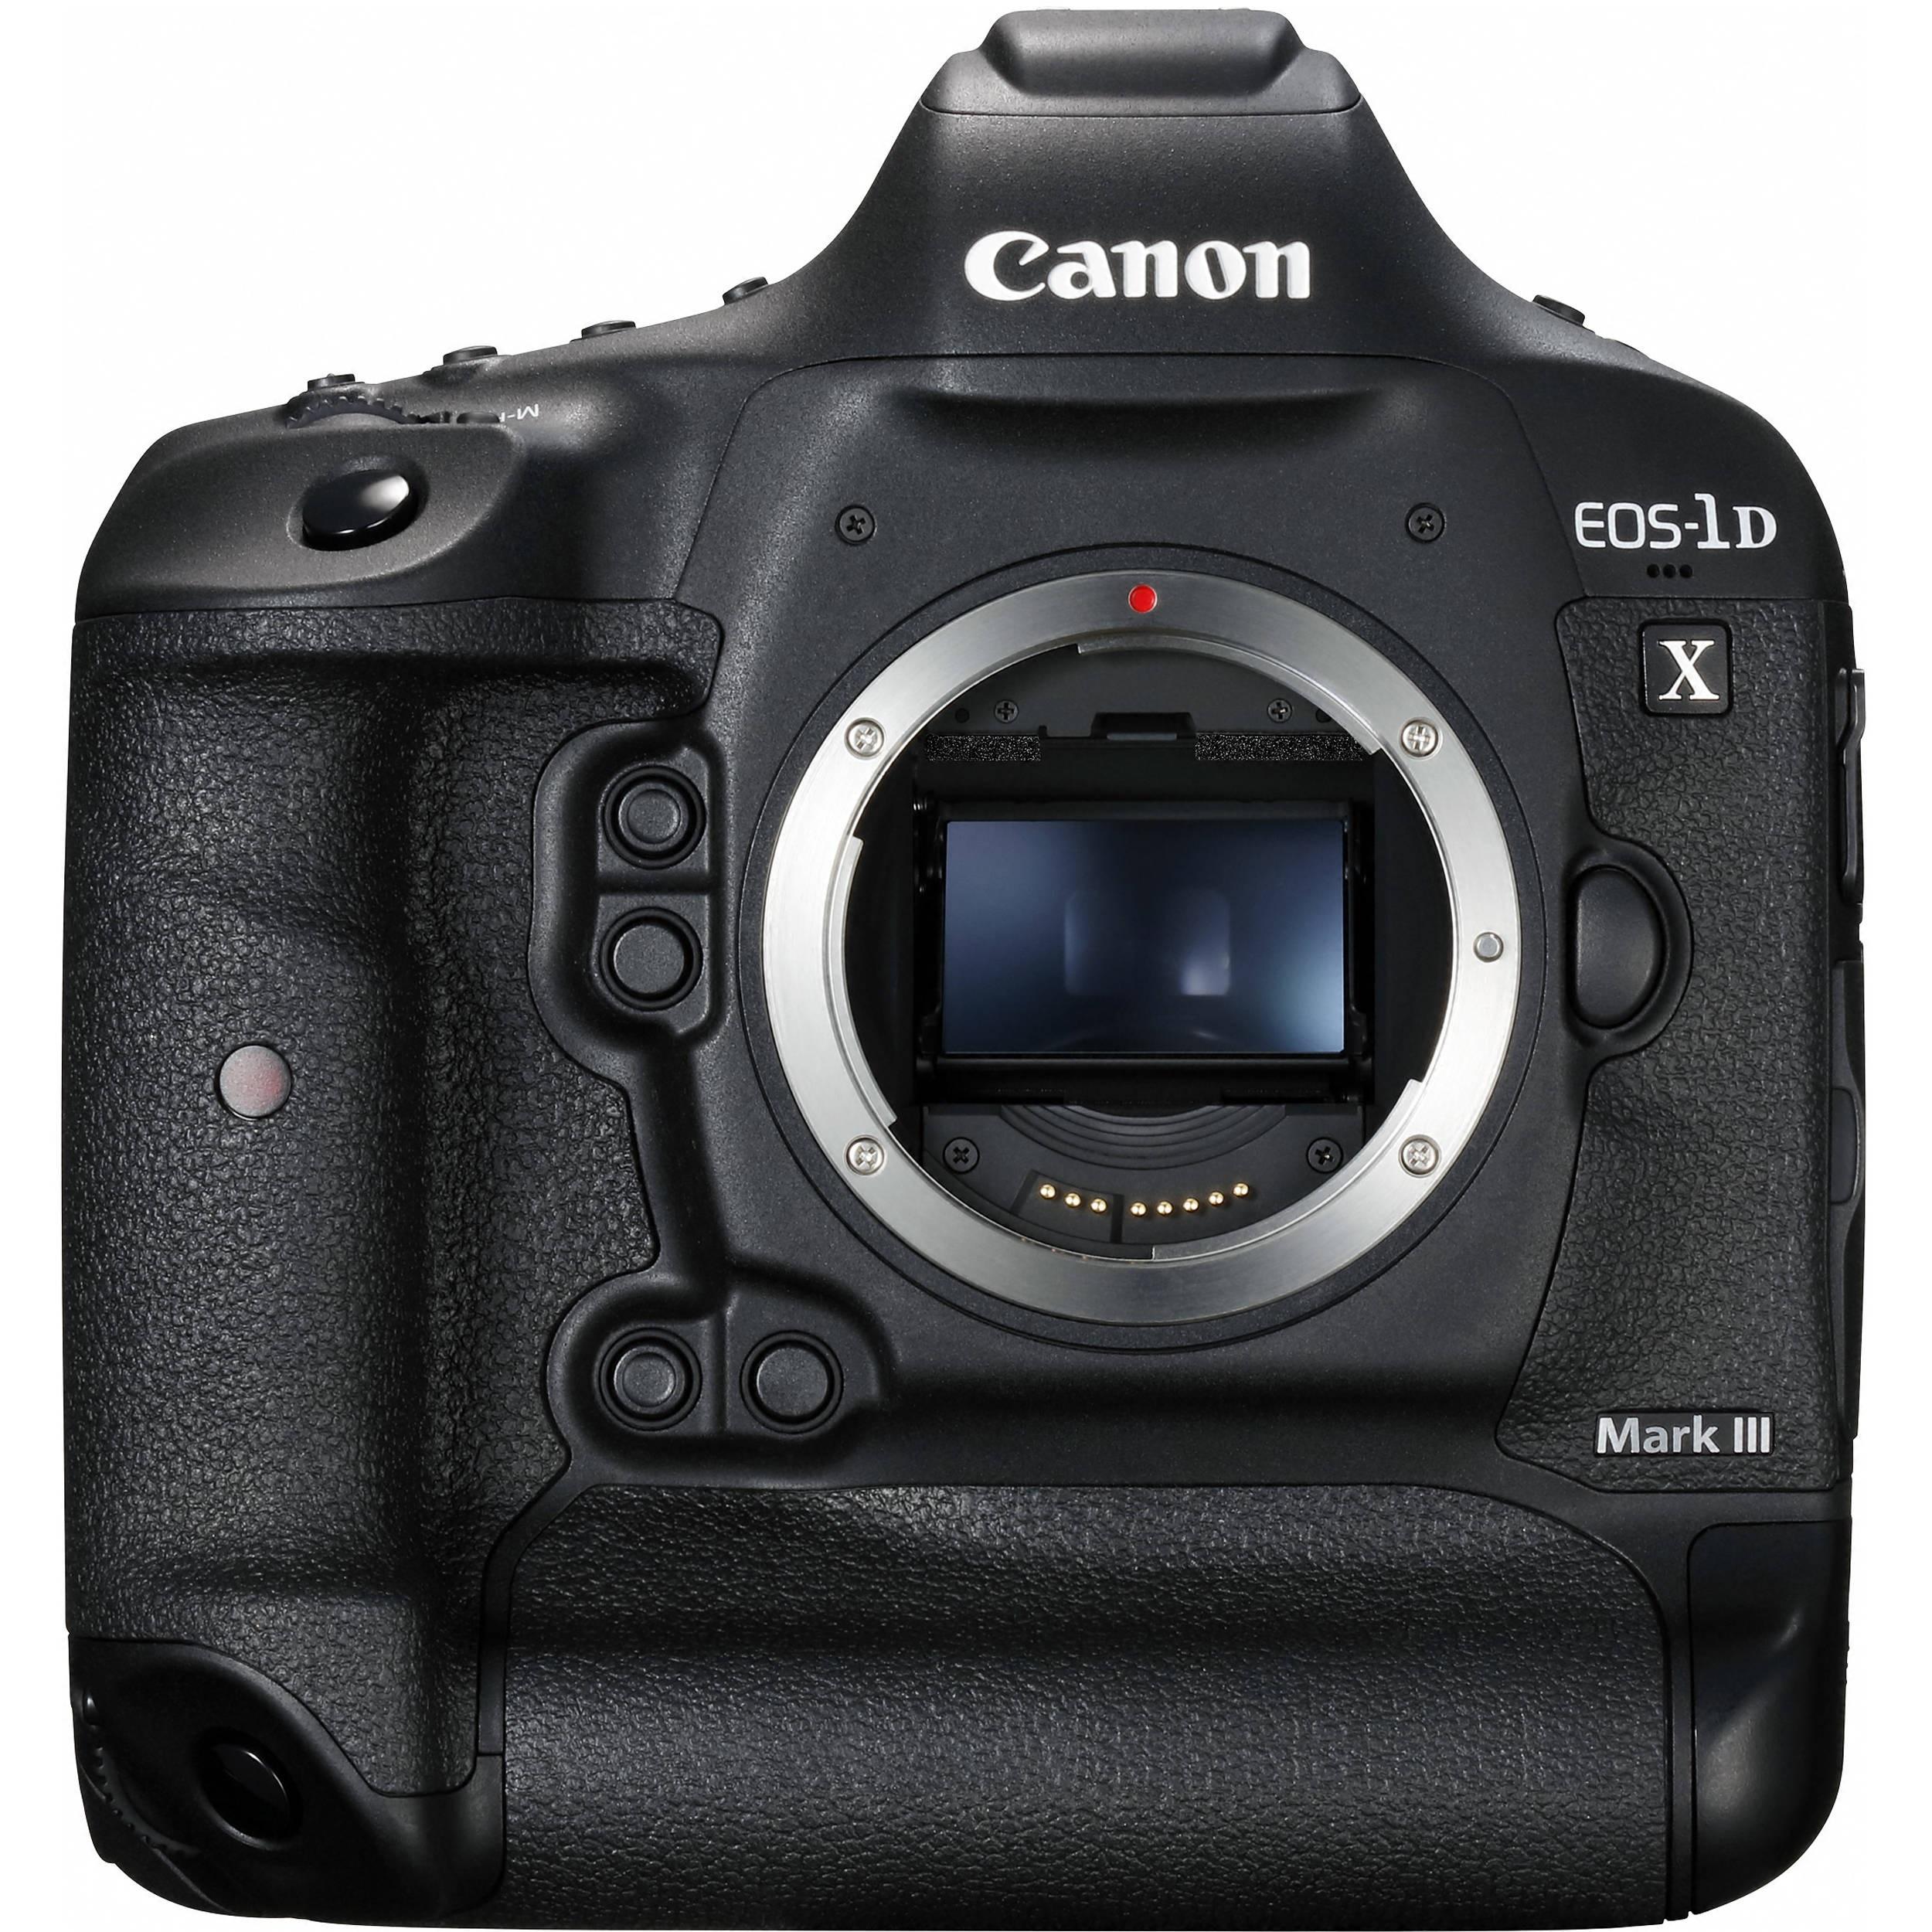 Canon EOS 400D - Wikimedia Commons